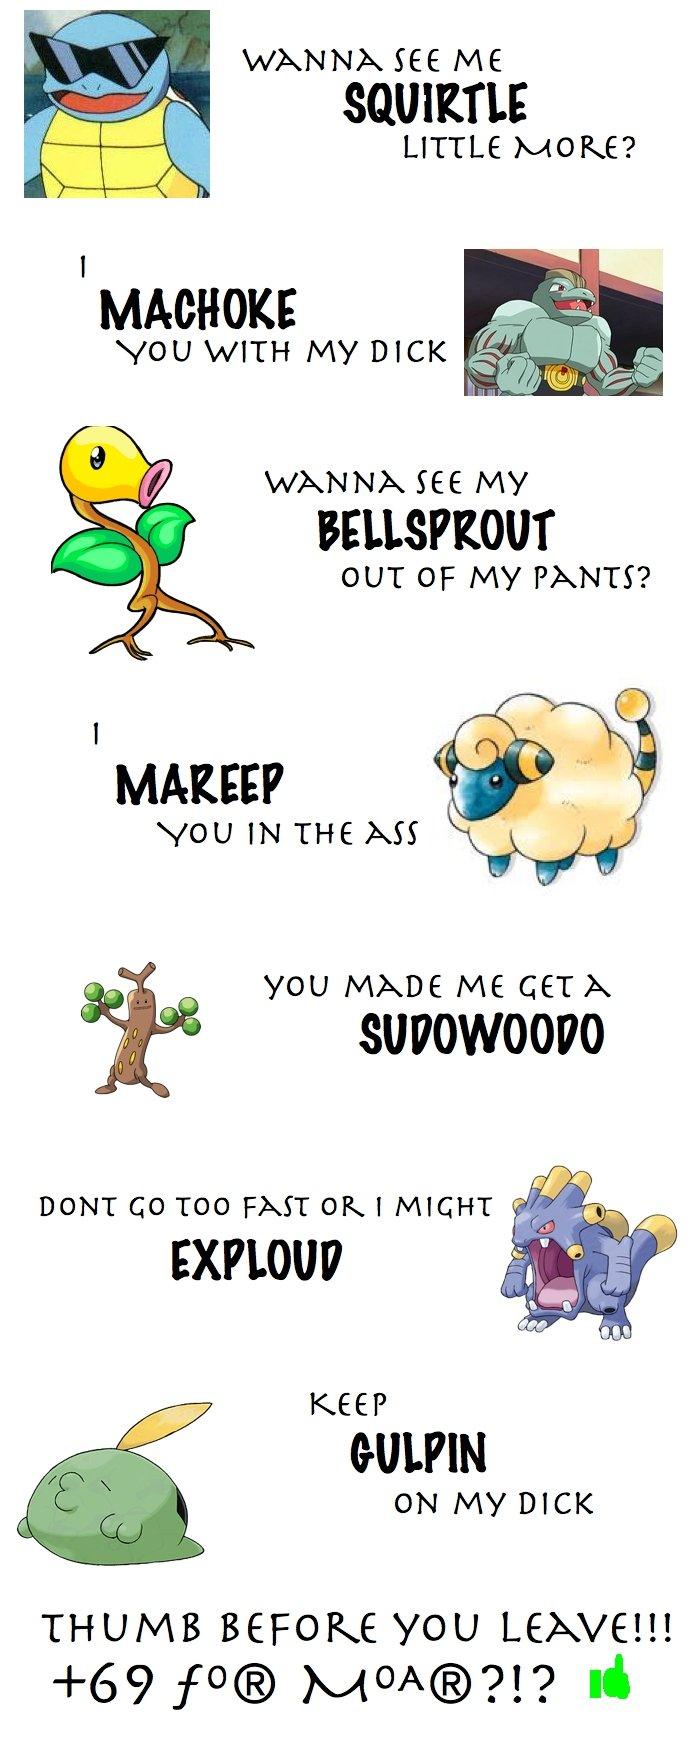 Your funny pokemon jokes